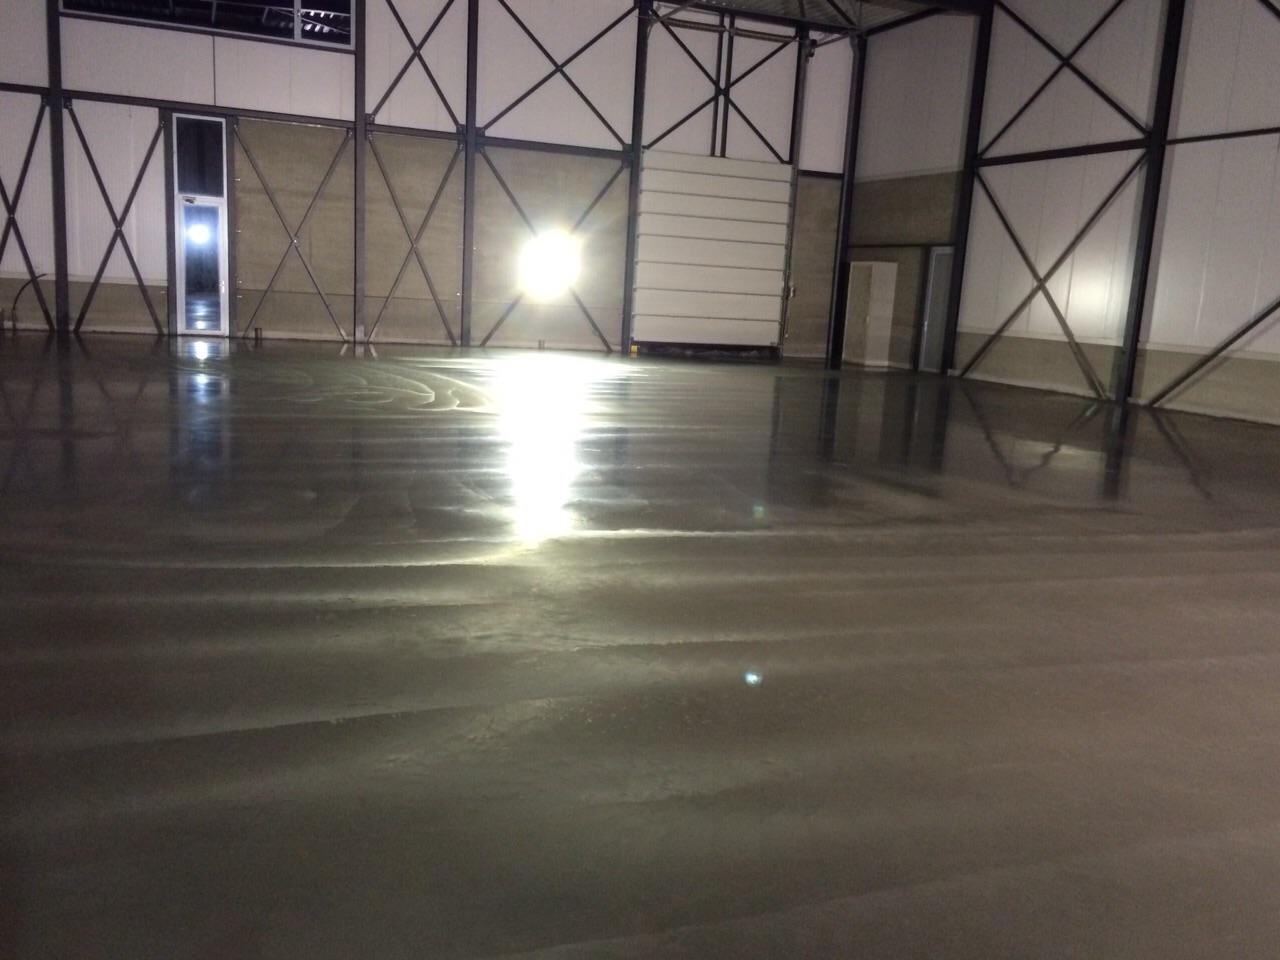 Afgewerkte betonvloer